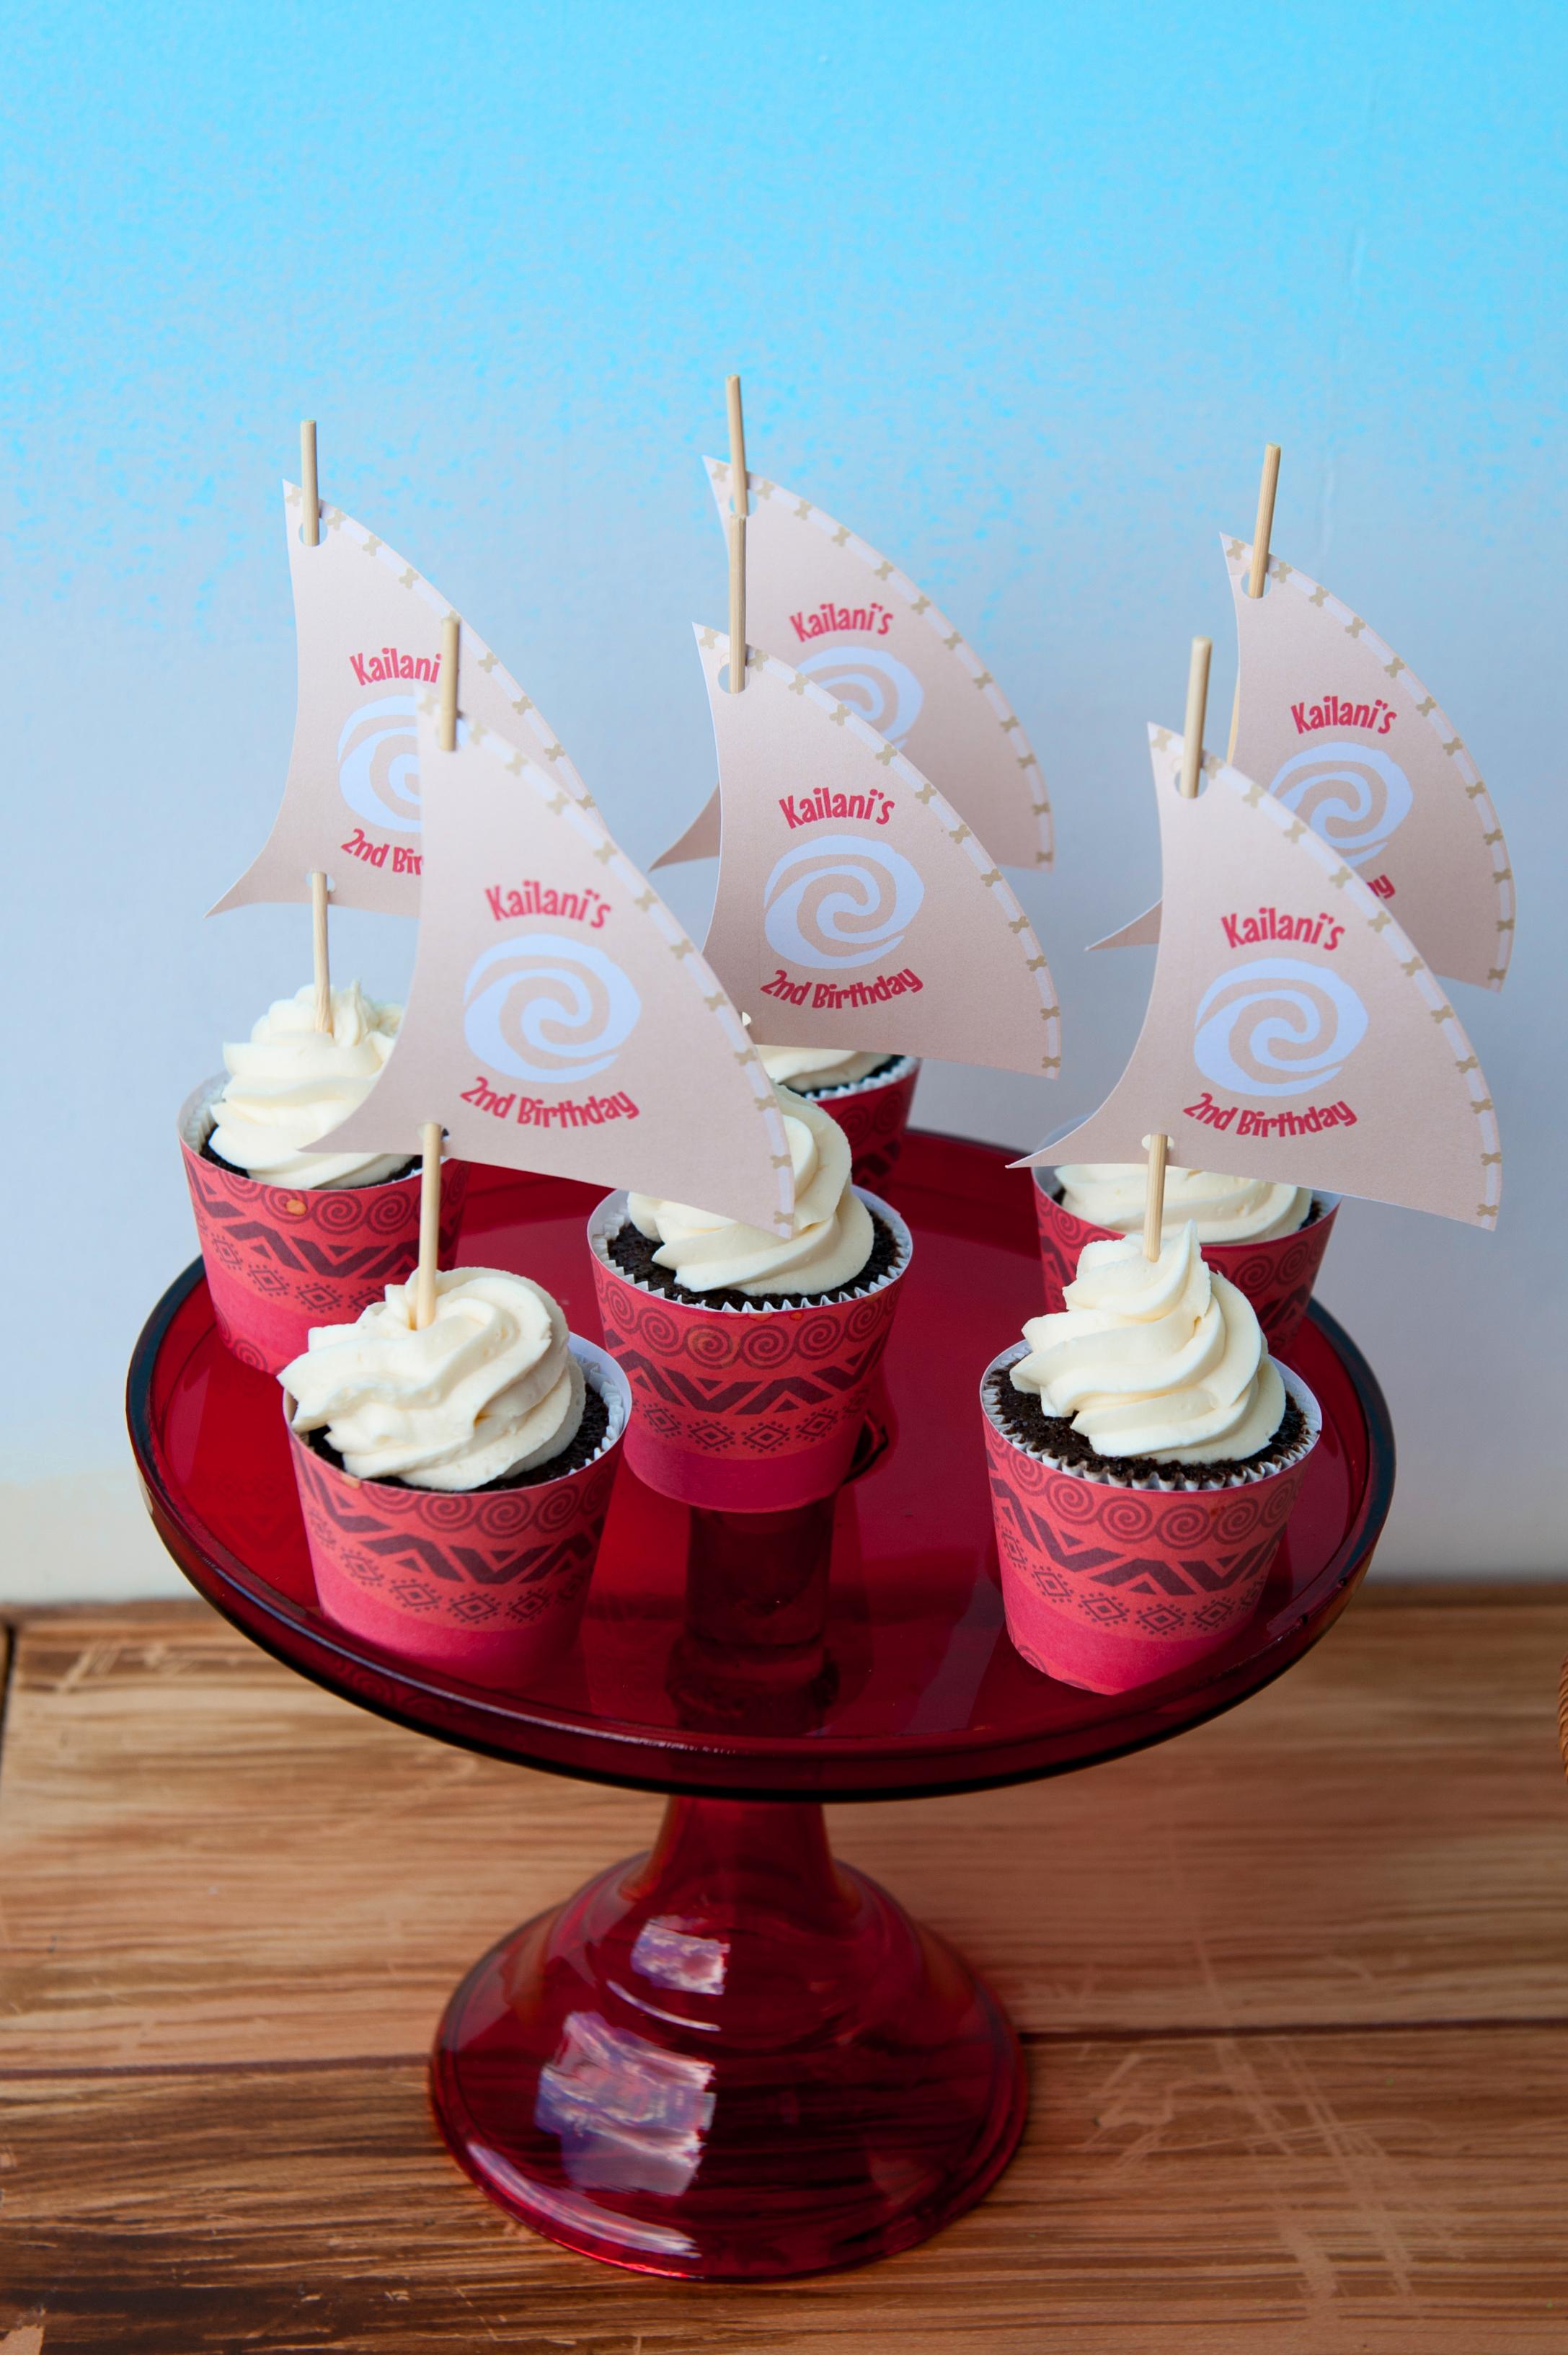 Moana Themed Birthday Party Caked By Cynthia White